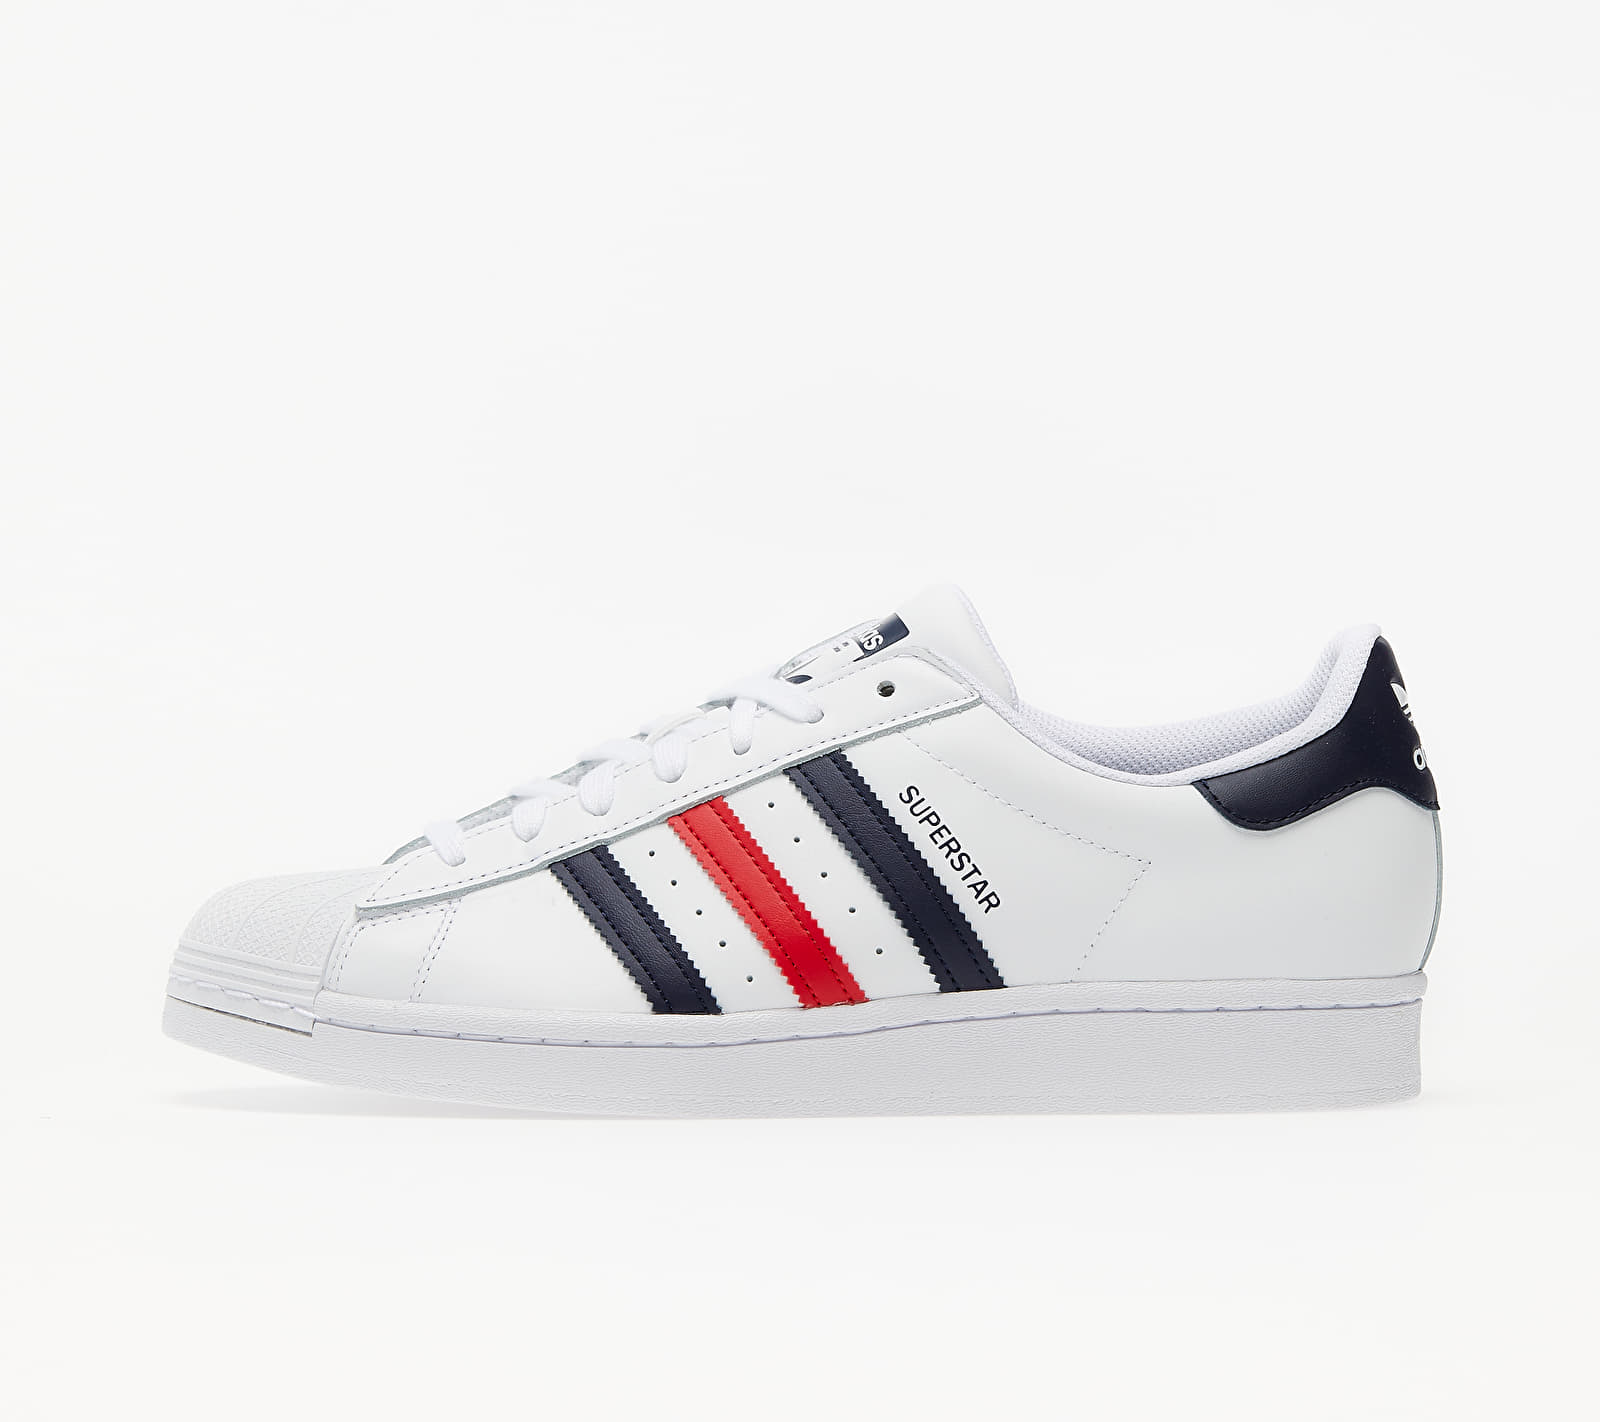 adidas Superstar Ftw White/ Scarlet/ Ftw White EUR 47 1/3